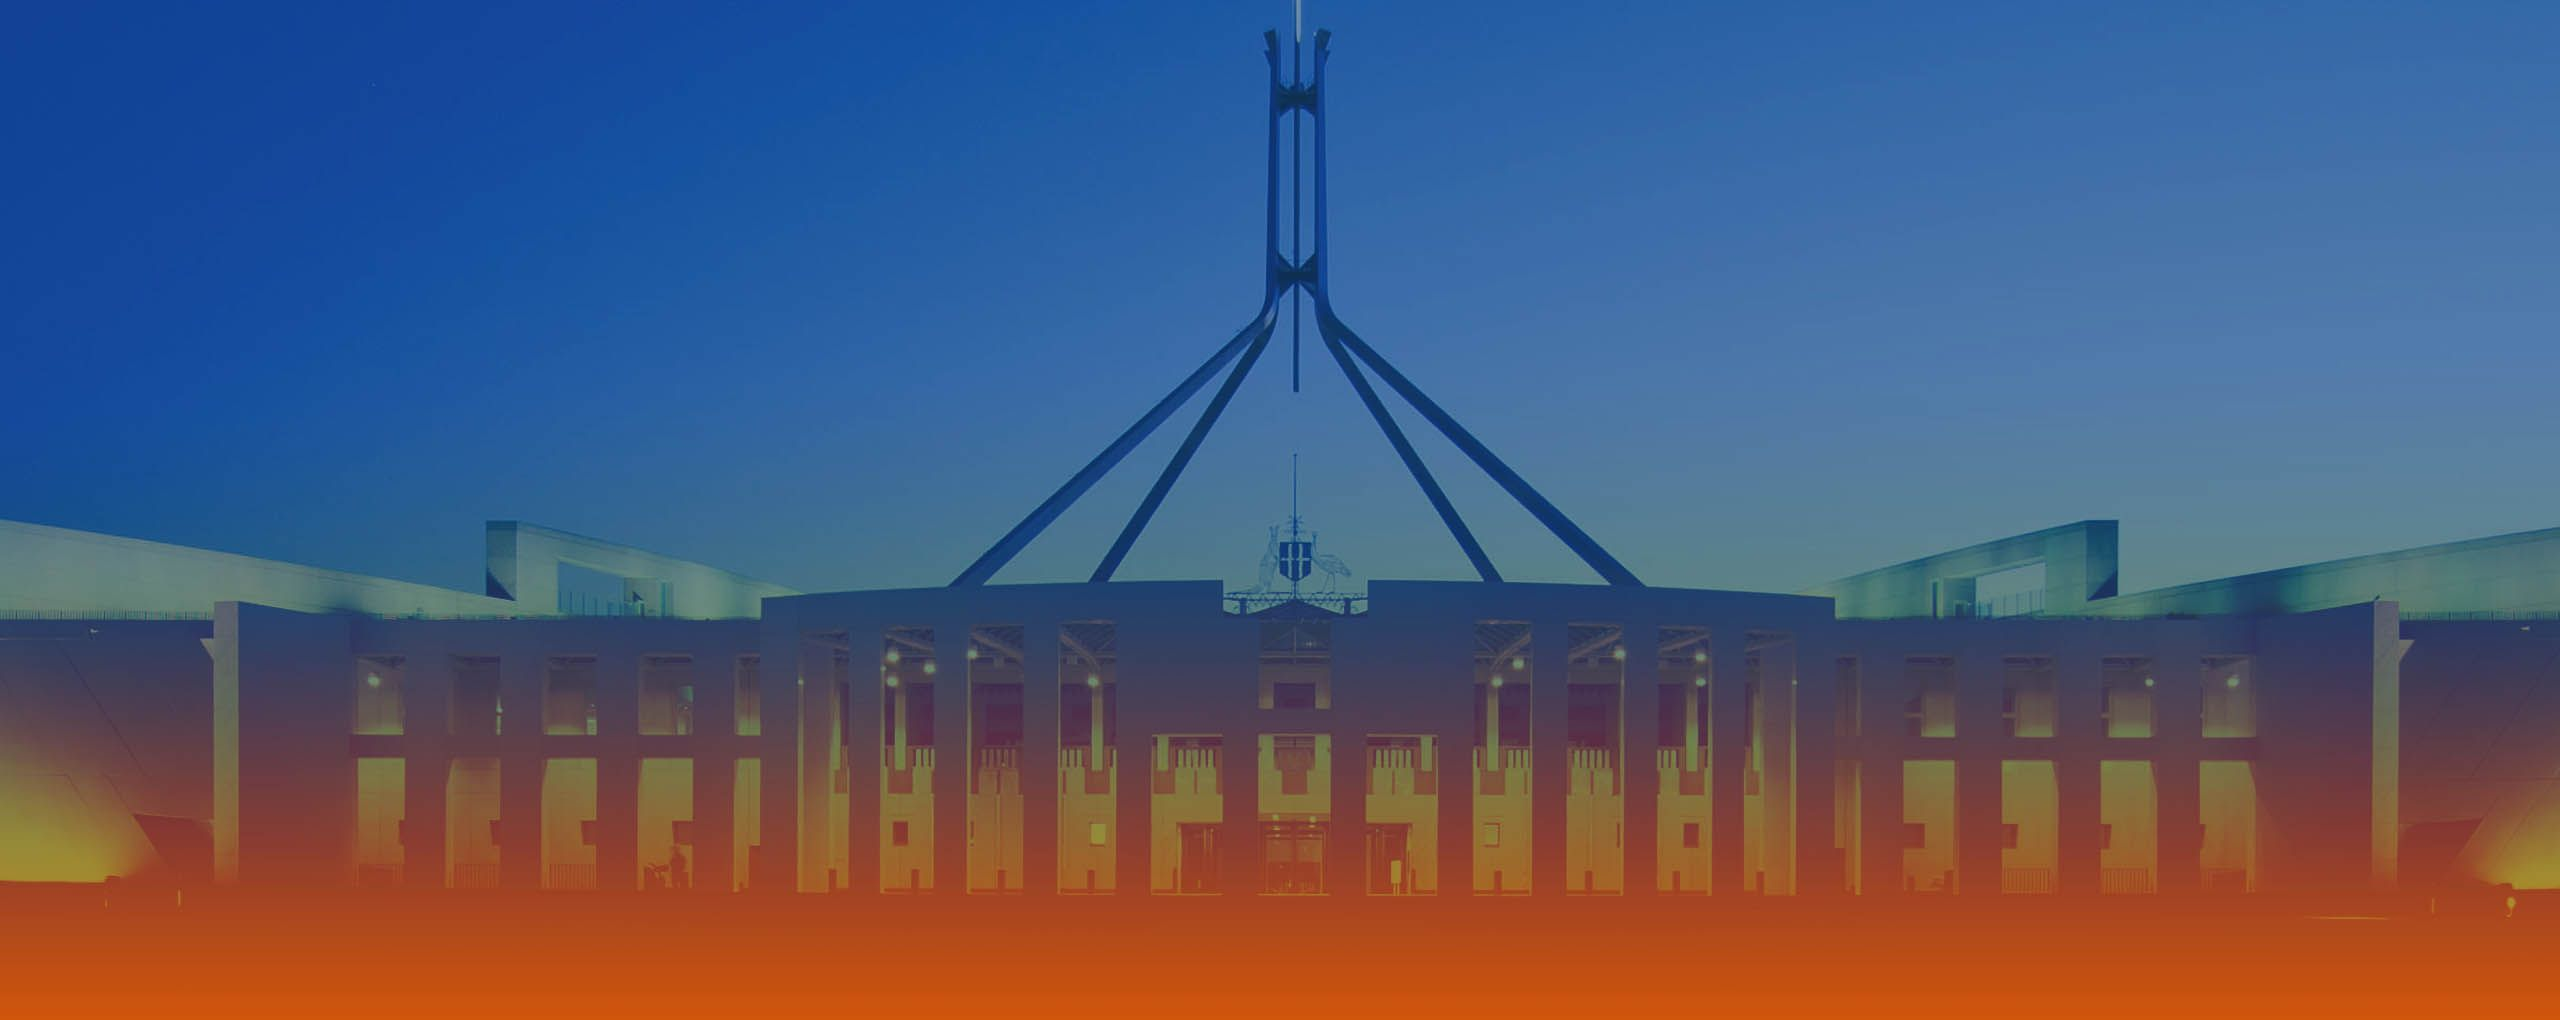 35++ Senior accountant resume sample australia Examples